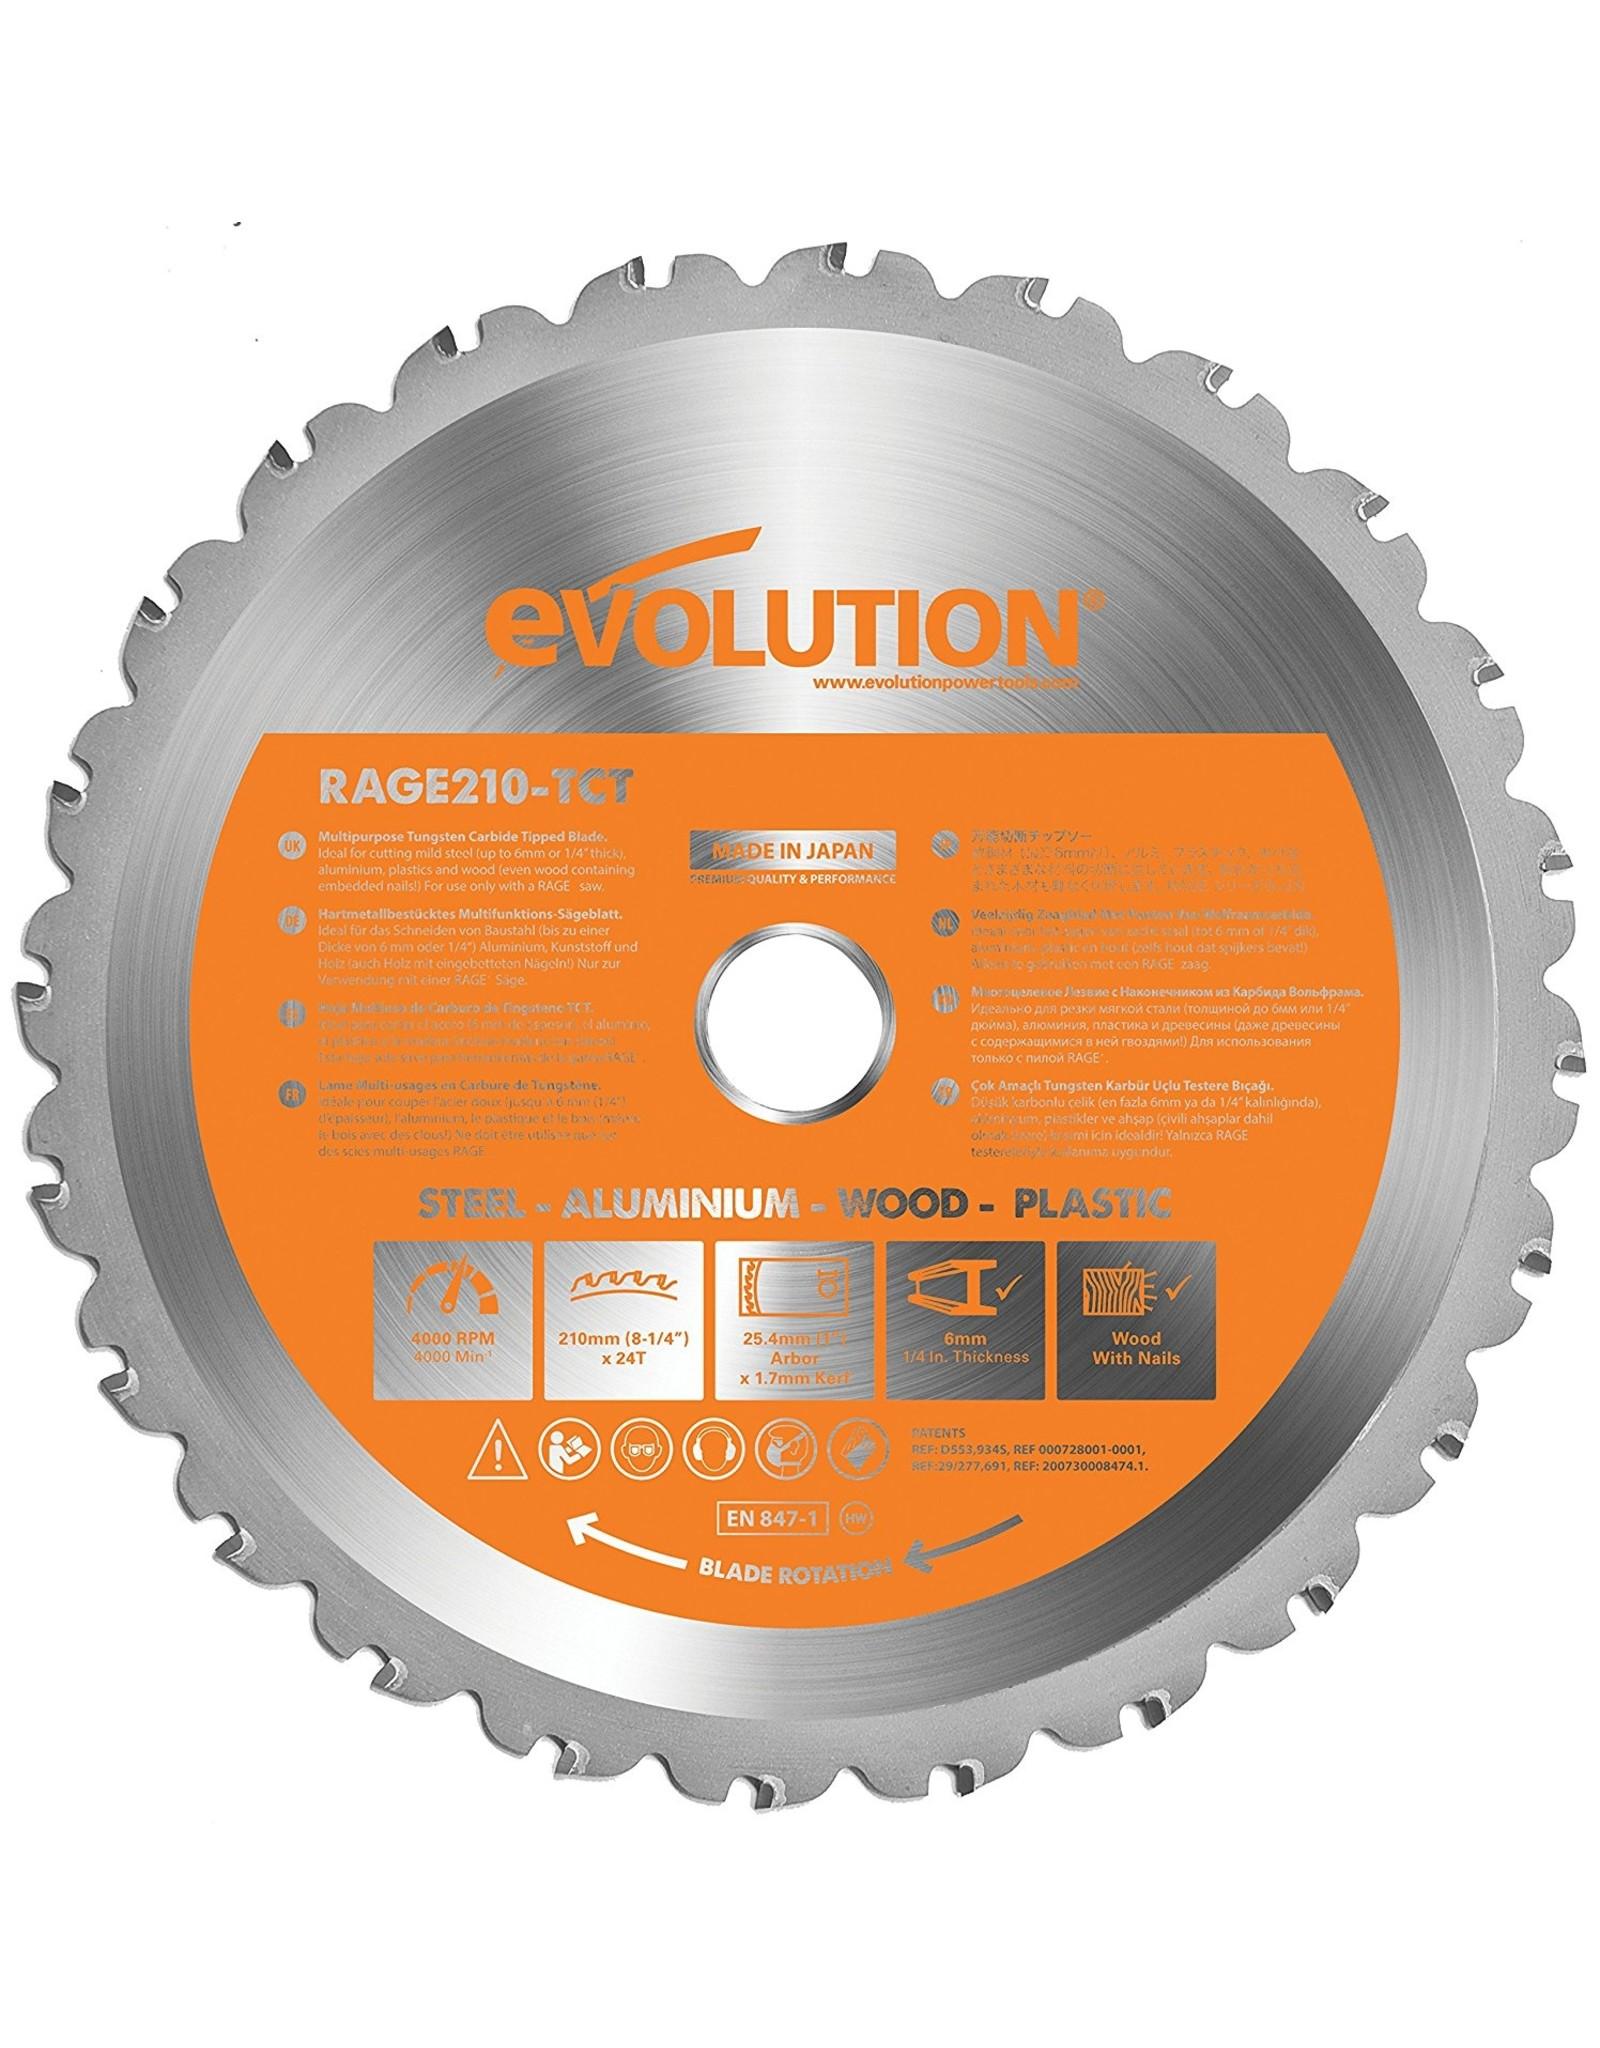 Evolution Power Tools Build Line MULTI-MATERIAL GEHRUNGSSÄGE RAGE R210 CMS + MULTI-MATERIAL TCT-KLINGE RAGE 210 MM + DIAMANTKLINGE RAGE 210 MM